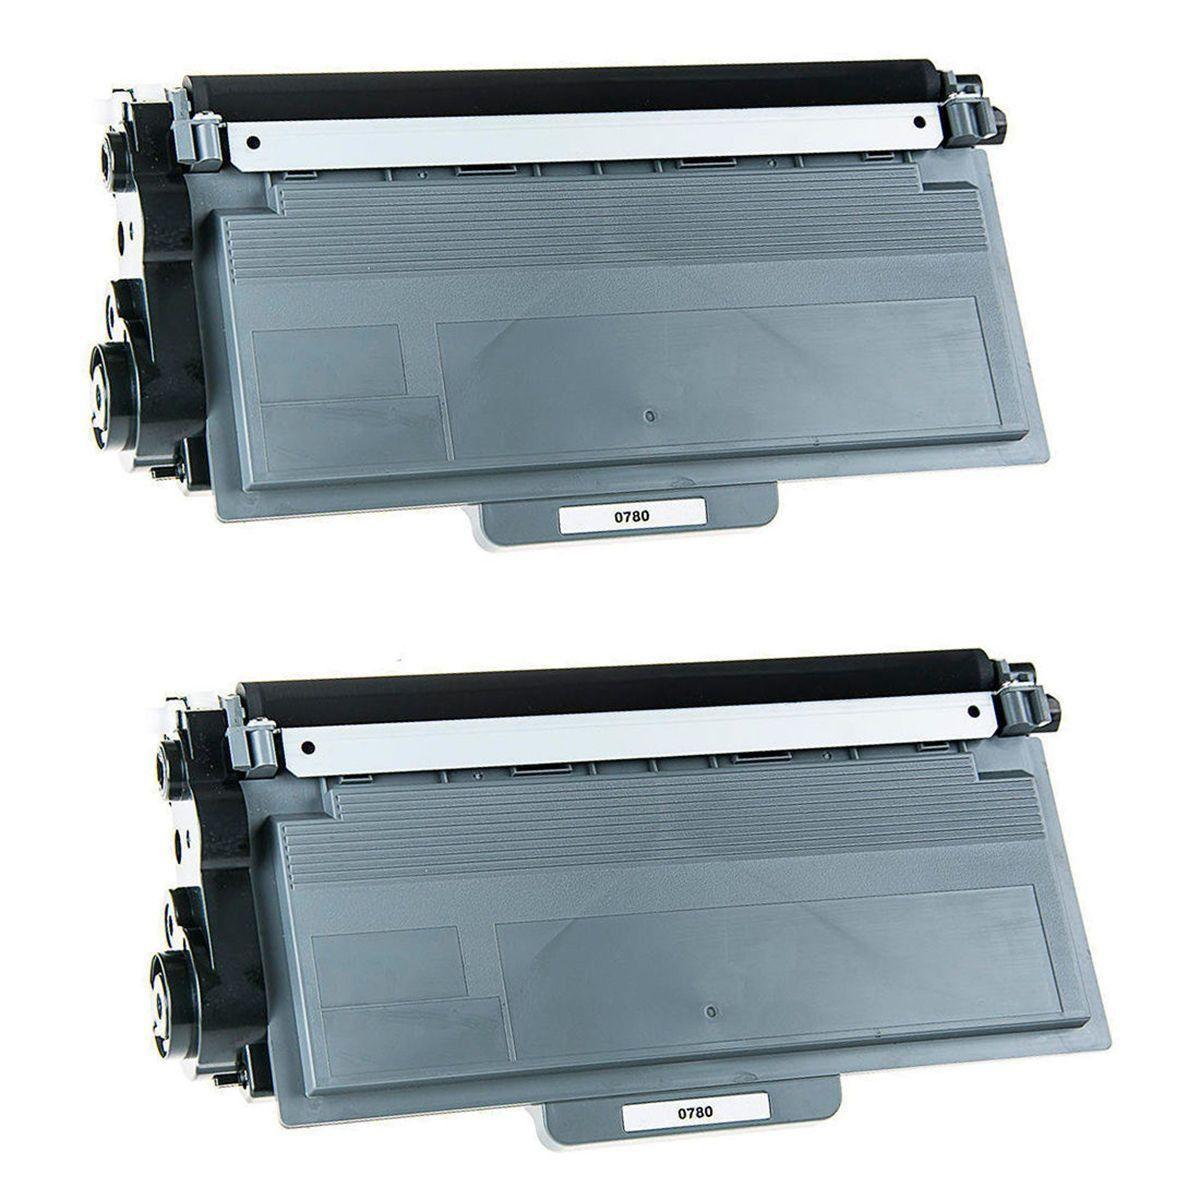 Compatível: Kit 2x Toner TN-780 TN-3392 para Brother HL-6182 6182dw DCP-8157 8157dn MFC-8712 8950 / Preto  / 12.000